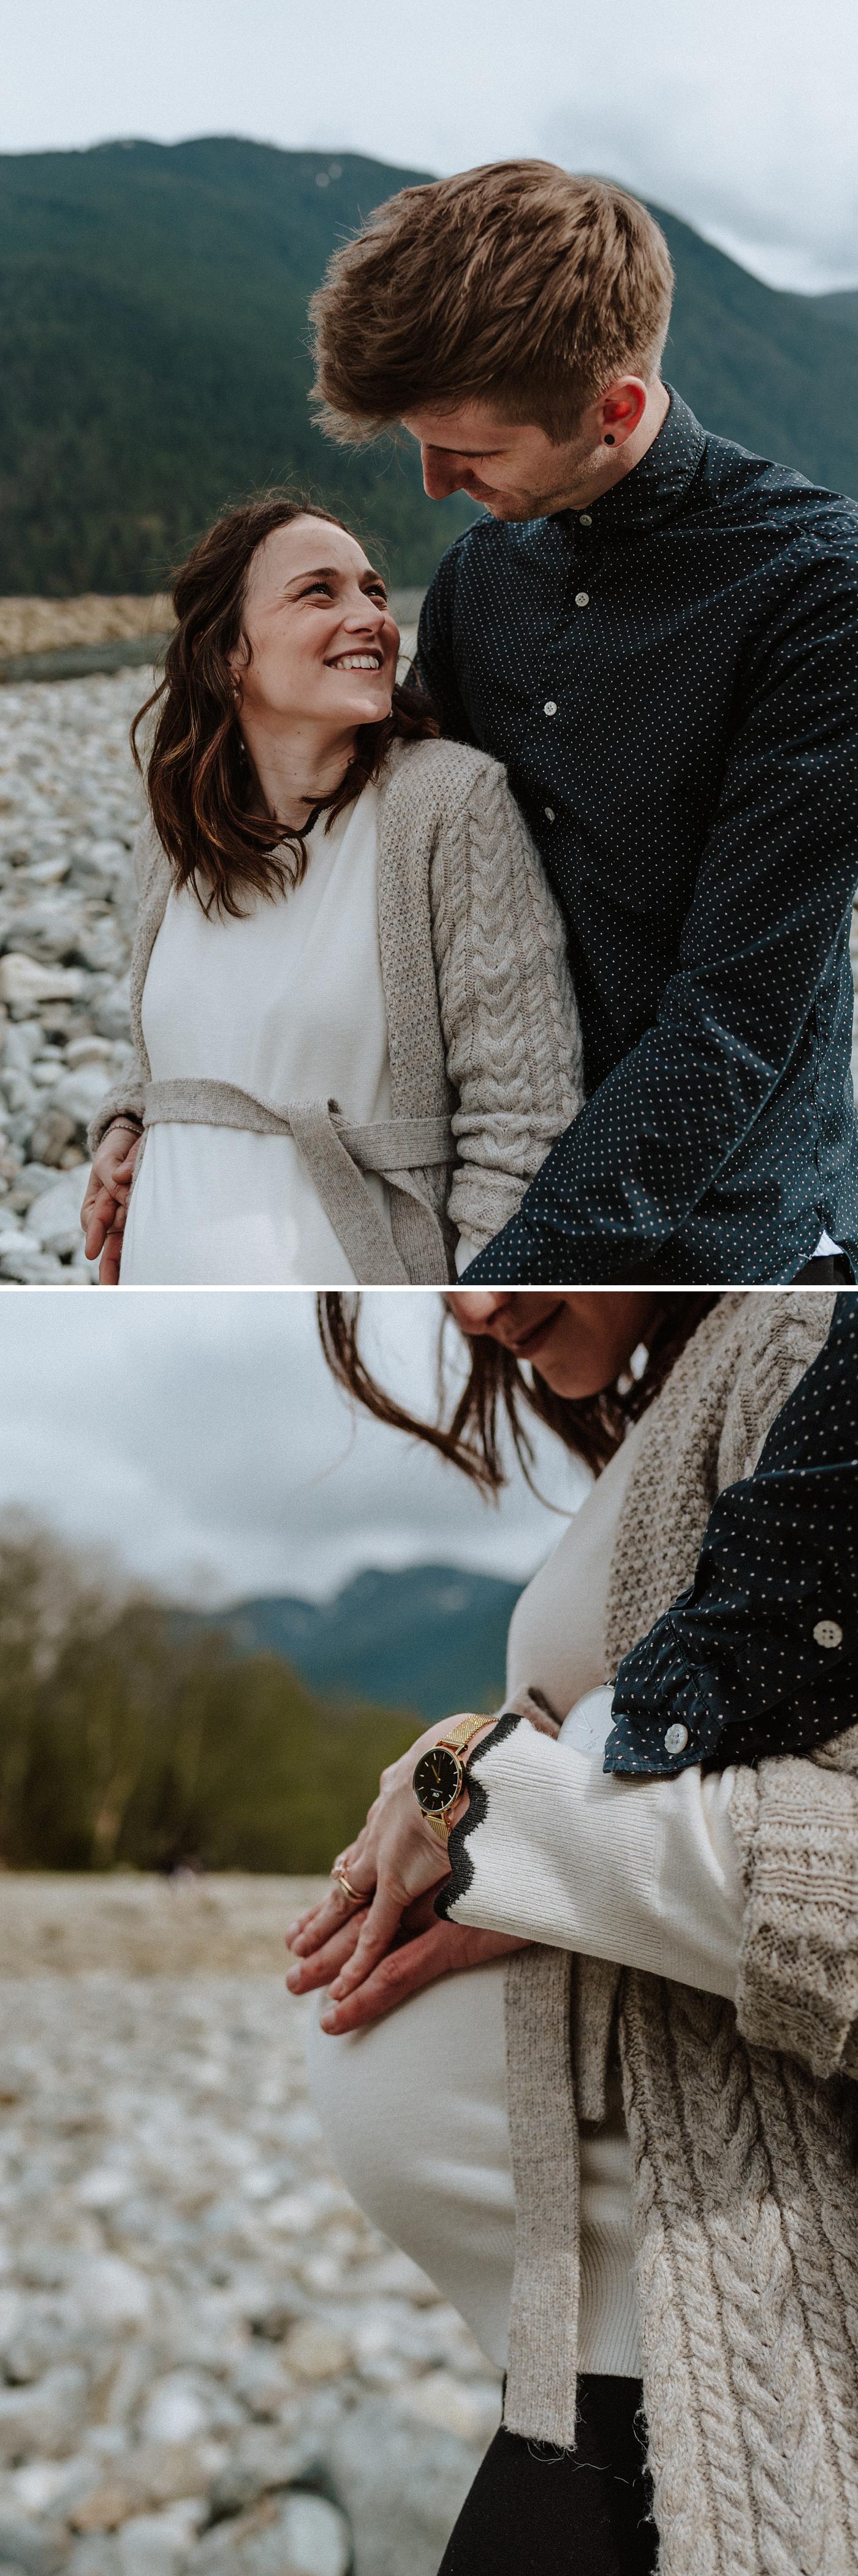 Maple-Ridge-Romantic-Wilderness-Maternity-Photography_0010.jpg